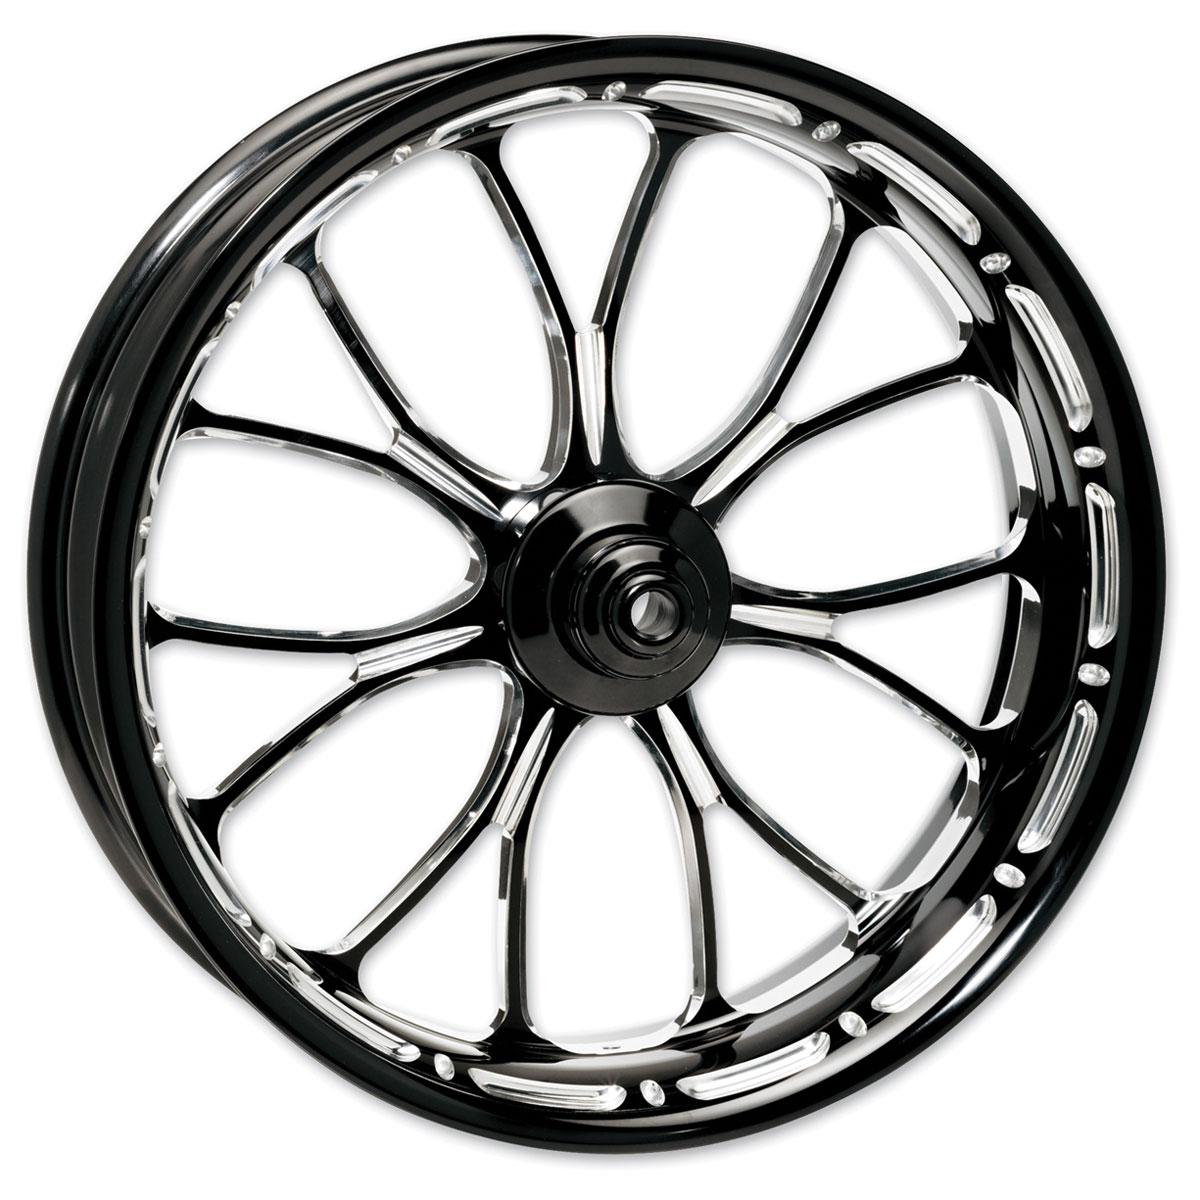 Performance Machine Heathen Platinum Cut Front Wheel 18x3.5 Non-ABS Dual Disc